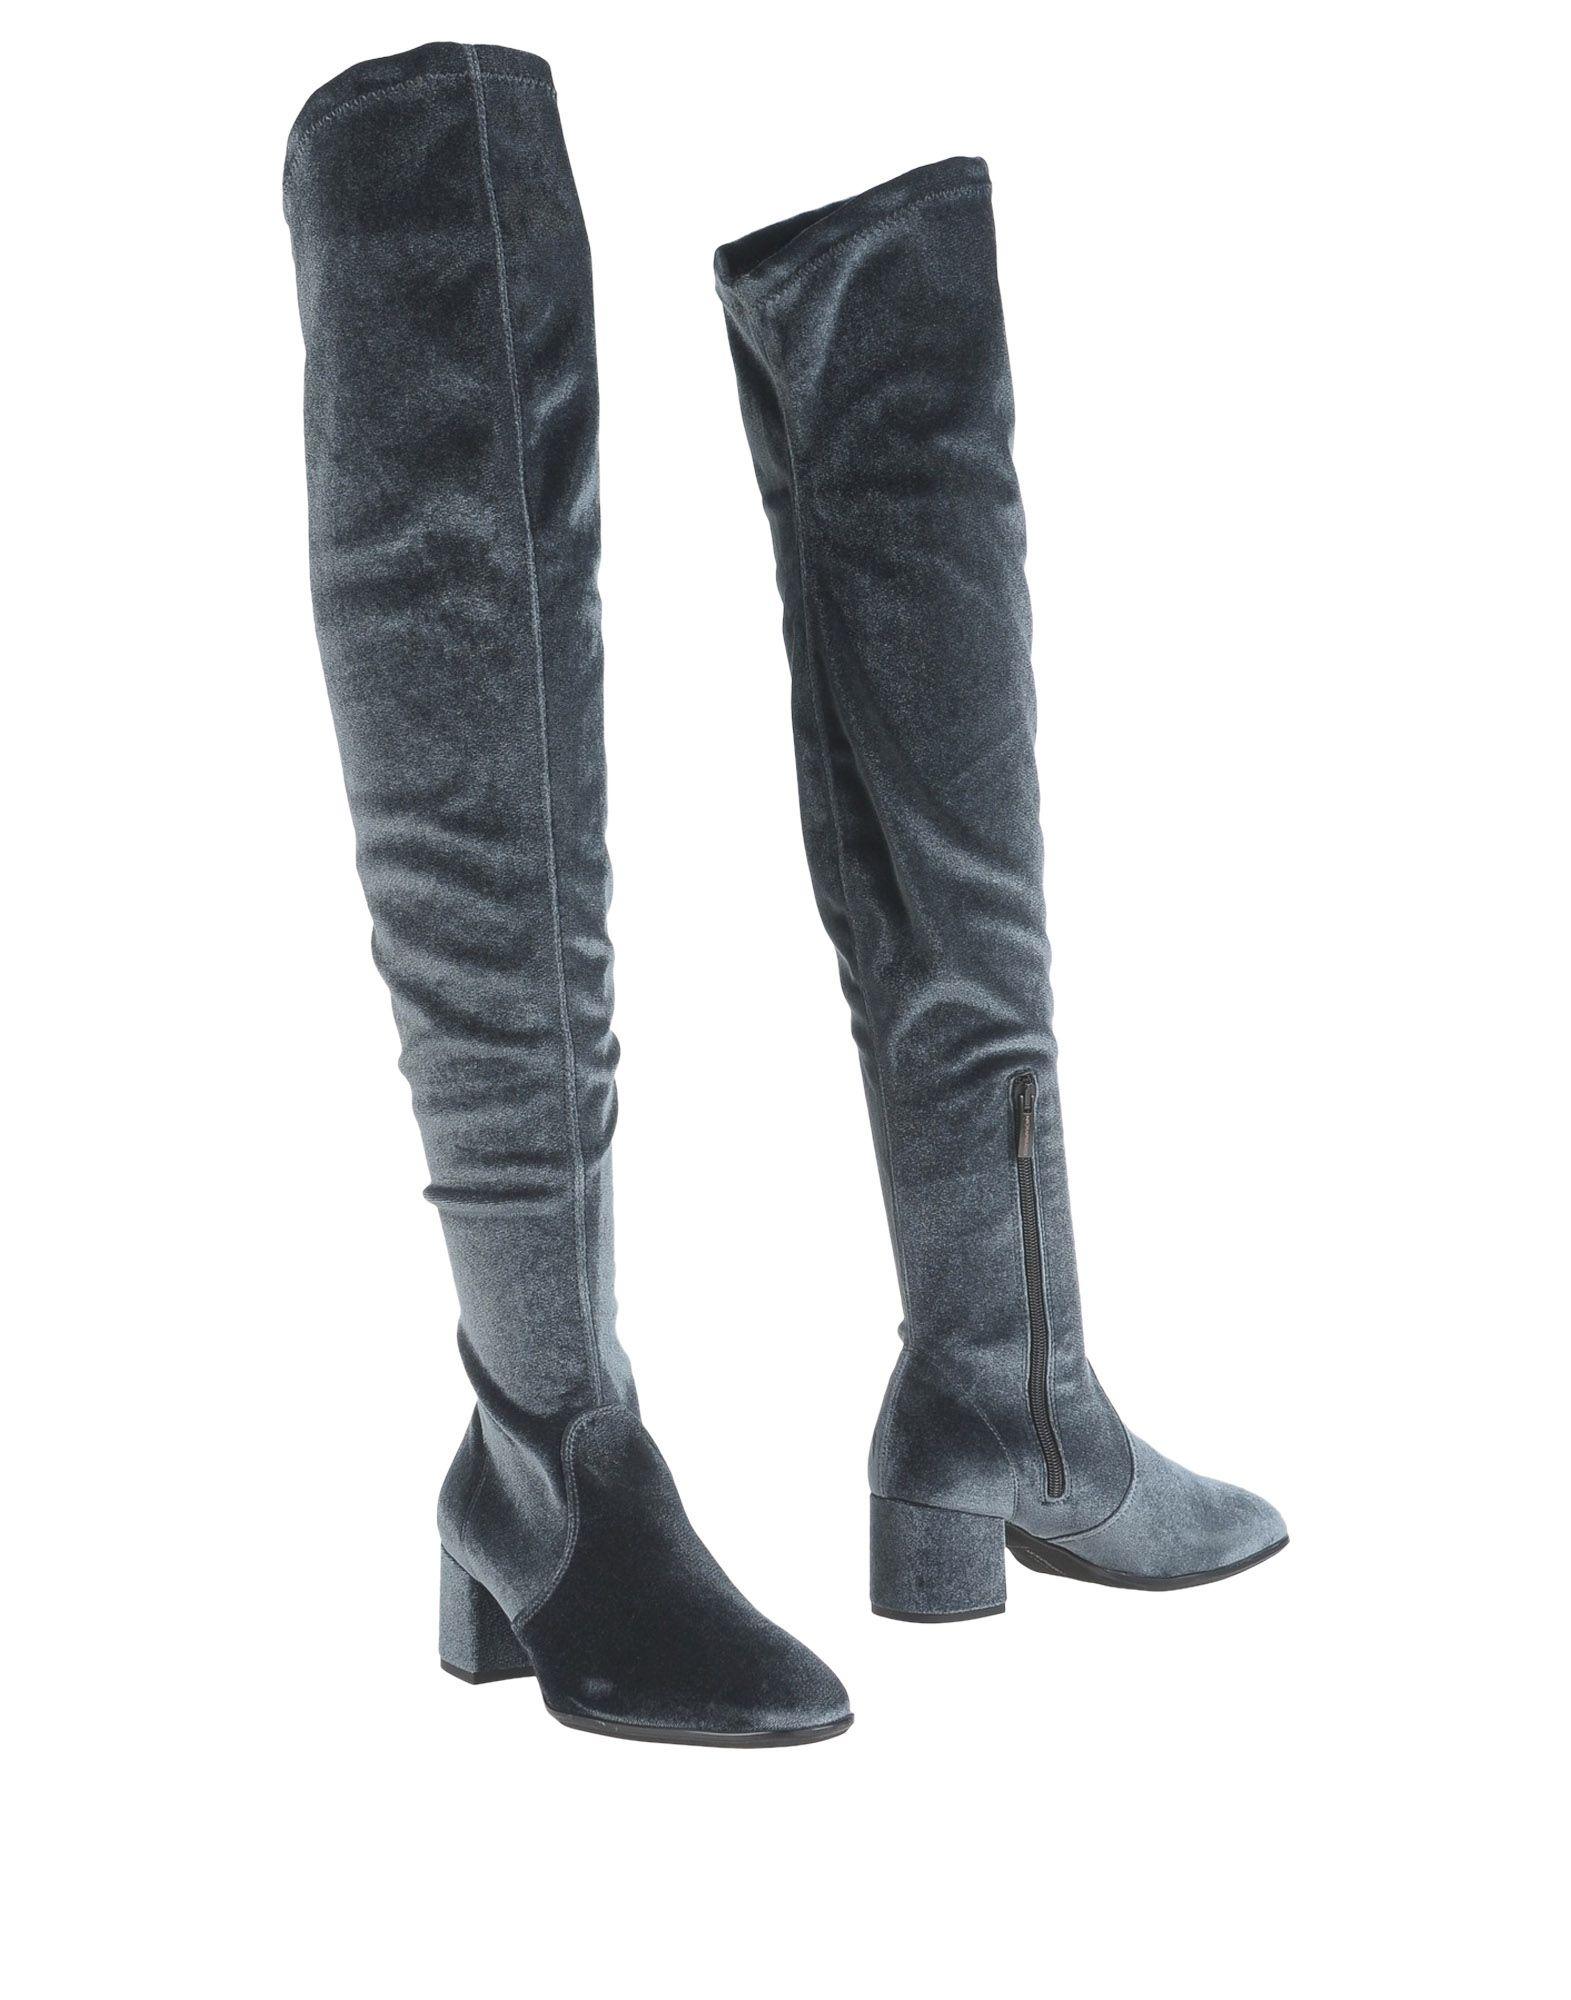 Nr Rapisardi Boots - Women Nr Rapisardi United Boots online on  United Rapisardi Kingdom - 11306727OB 7f8c4e